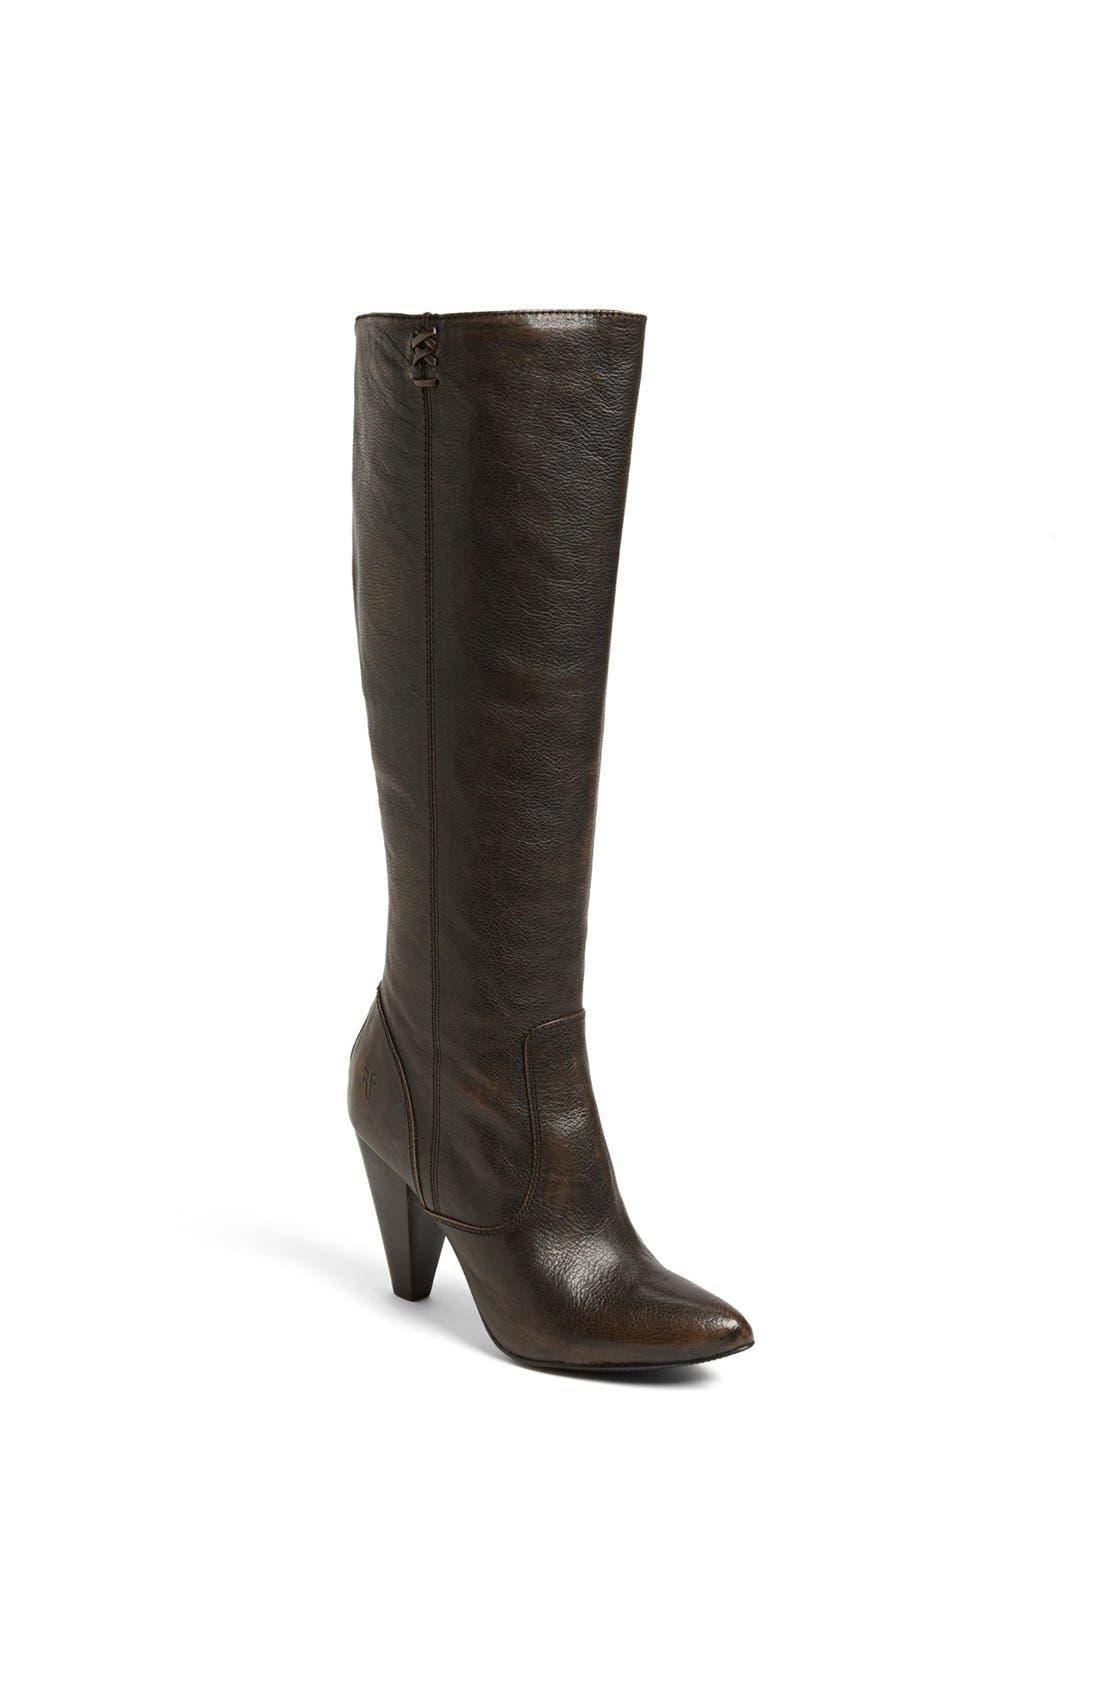 Alternate Image 1 Selected - Frye 'Regina Zip' Boot